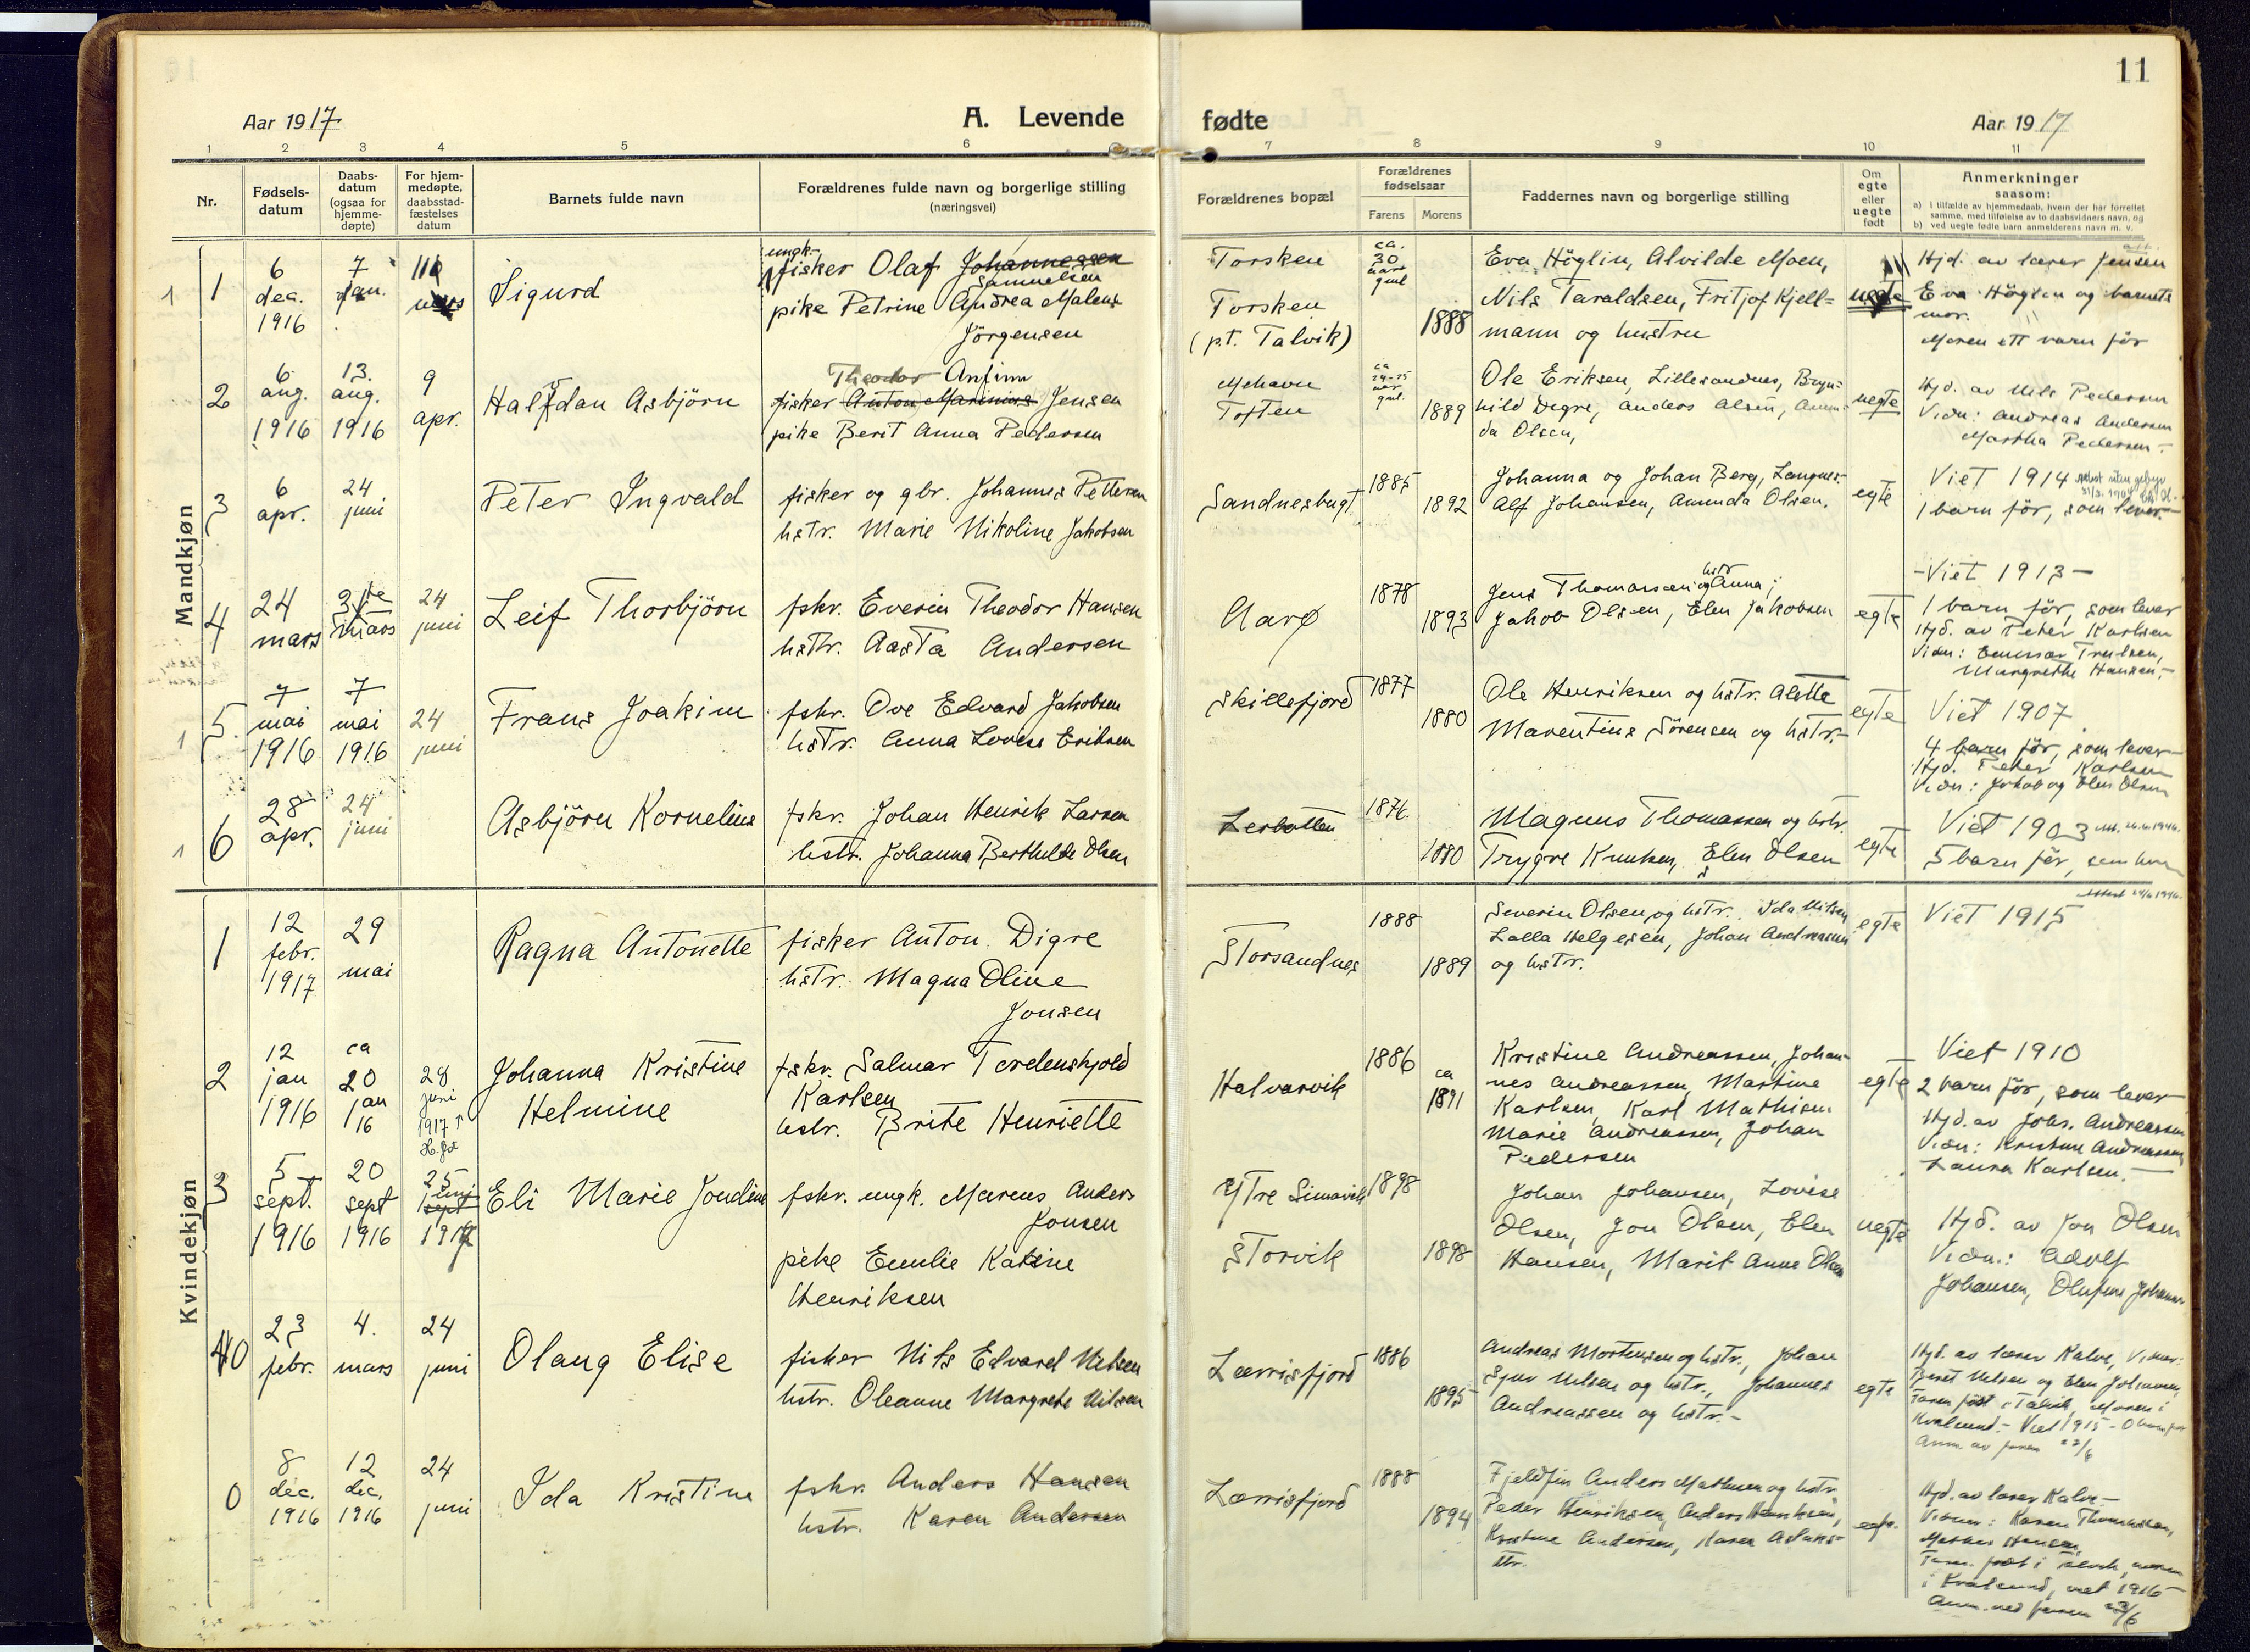 SATØ, Talvik sokneprestkontor, H/Ha/L0018kirke: Ministerialbok nr. 18, 1915-1924, s. 11